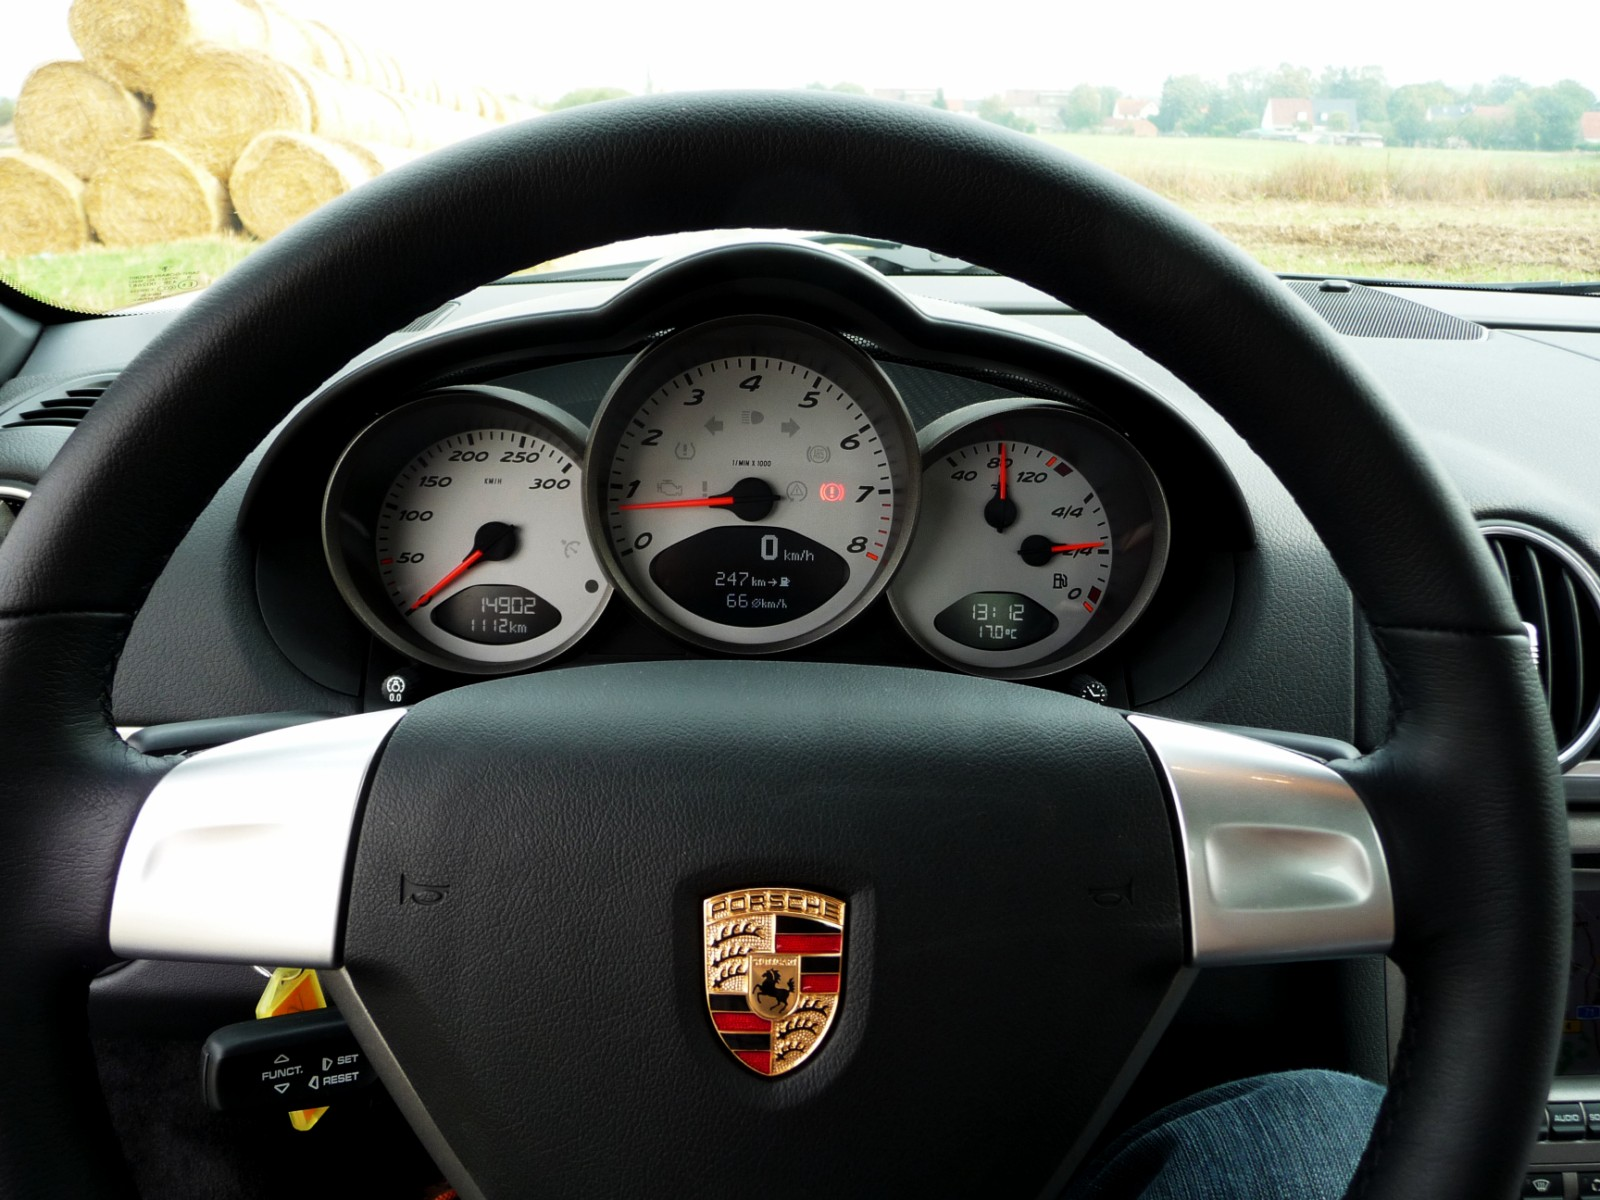 Vergleich Bmw Z4 Sdrive35i Gegen Porsche Cayman S